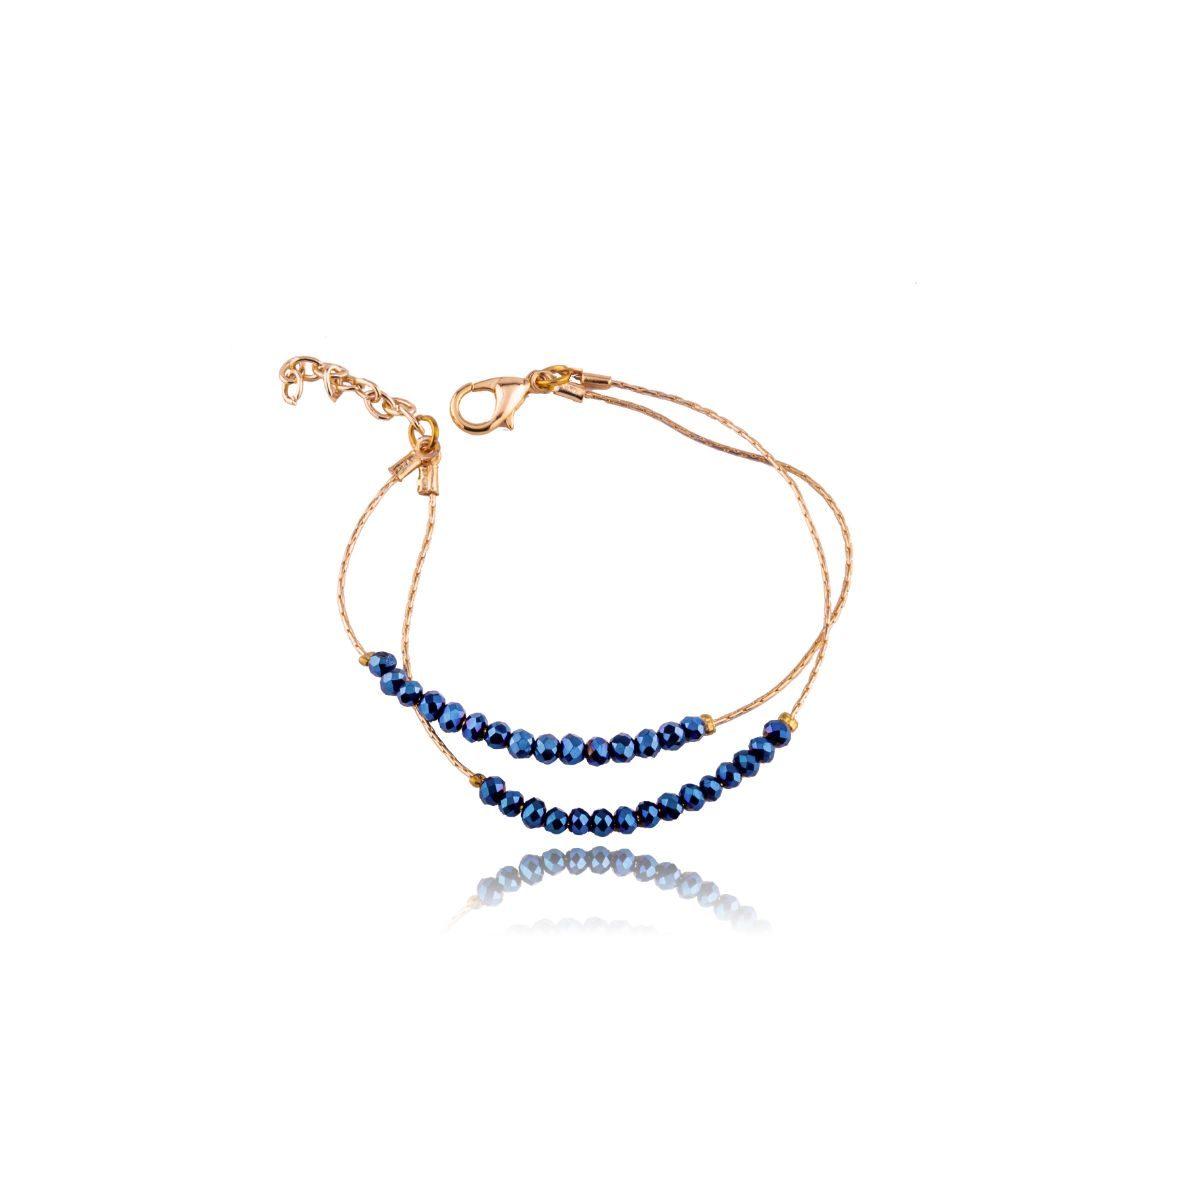 Oceanía pulsera fina de dos vueltas con cristales azules en cadenita acabada en dorado